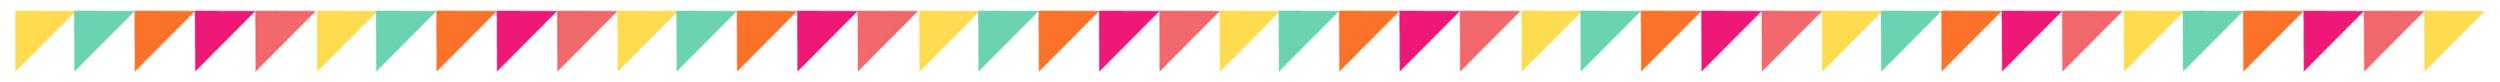 Bold & Pop : Best Squarespace Designers | Top Squarespace Designers | Squarespace web designers